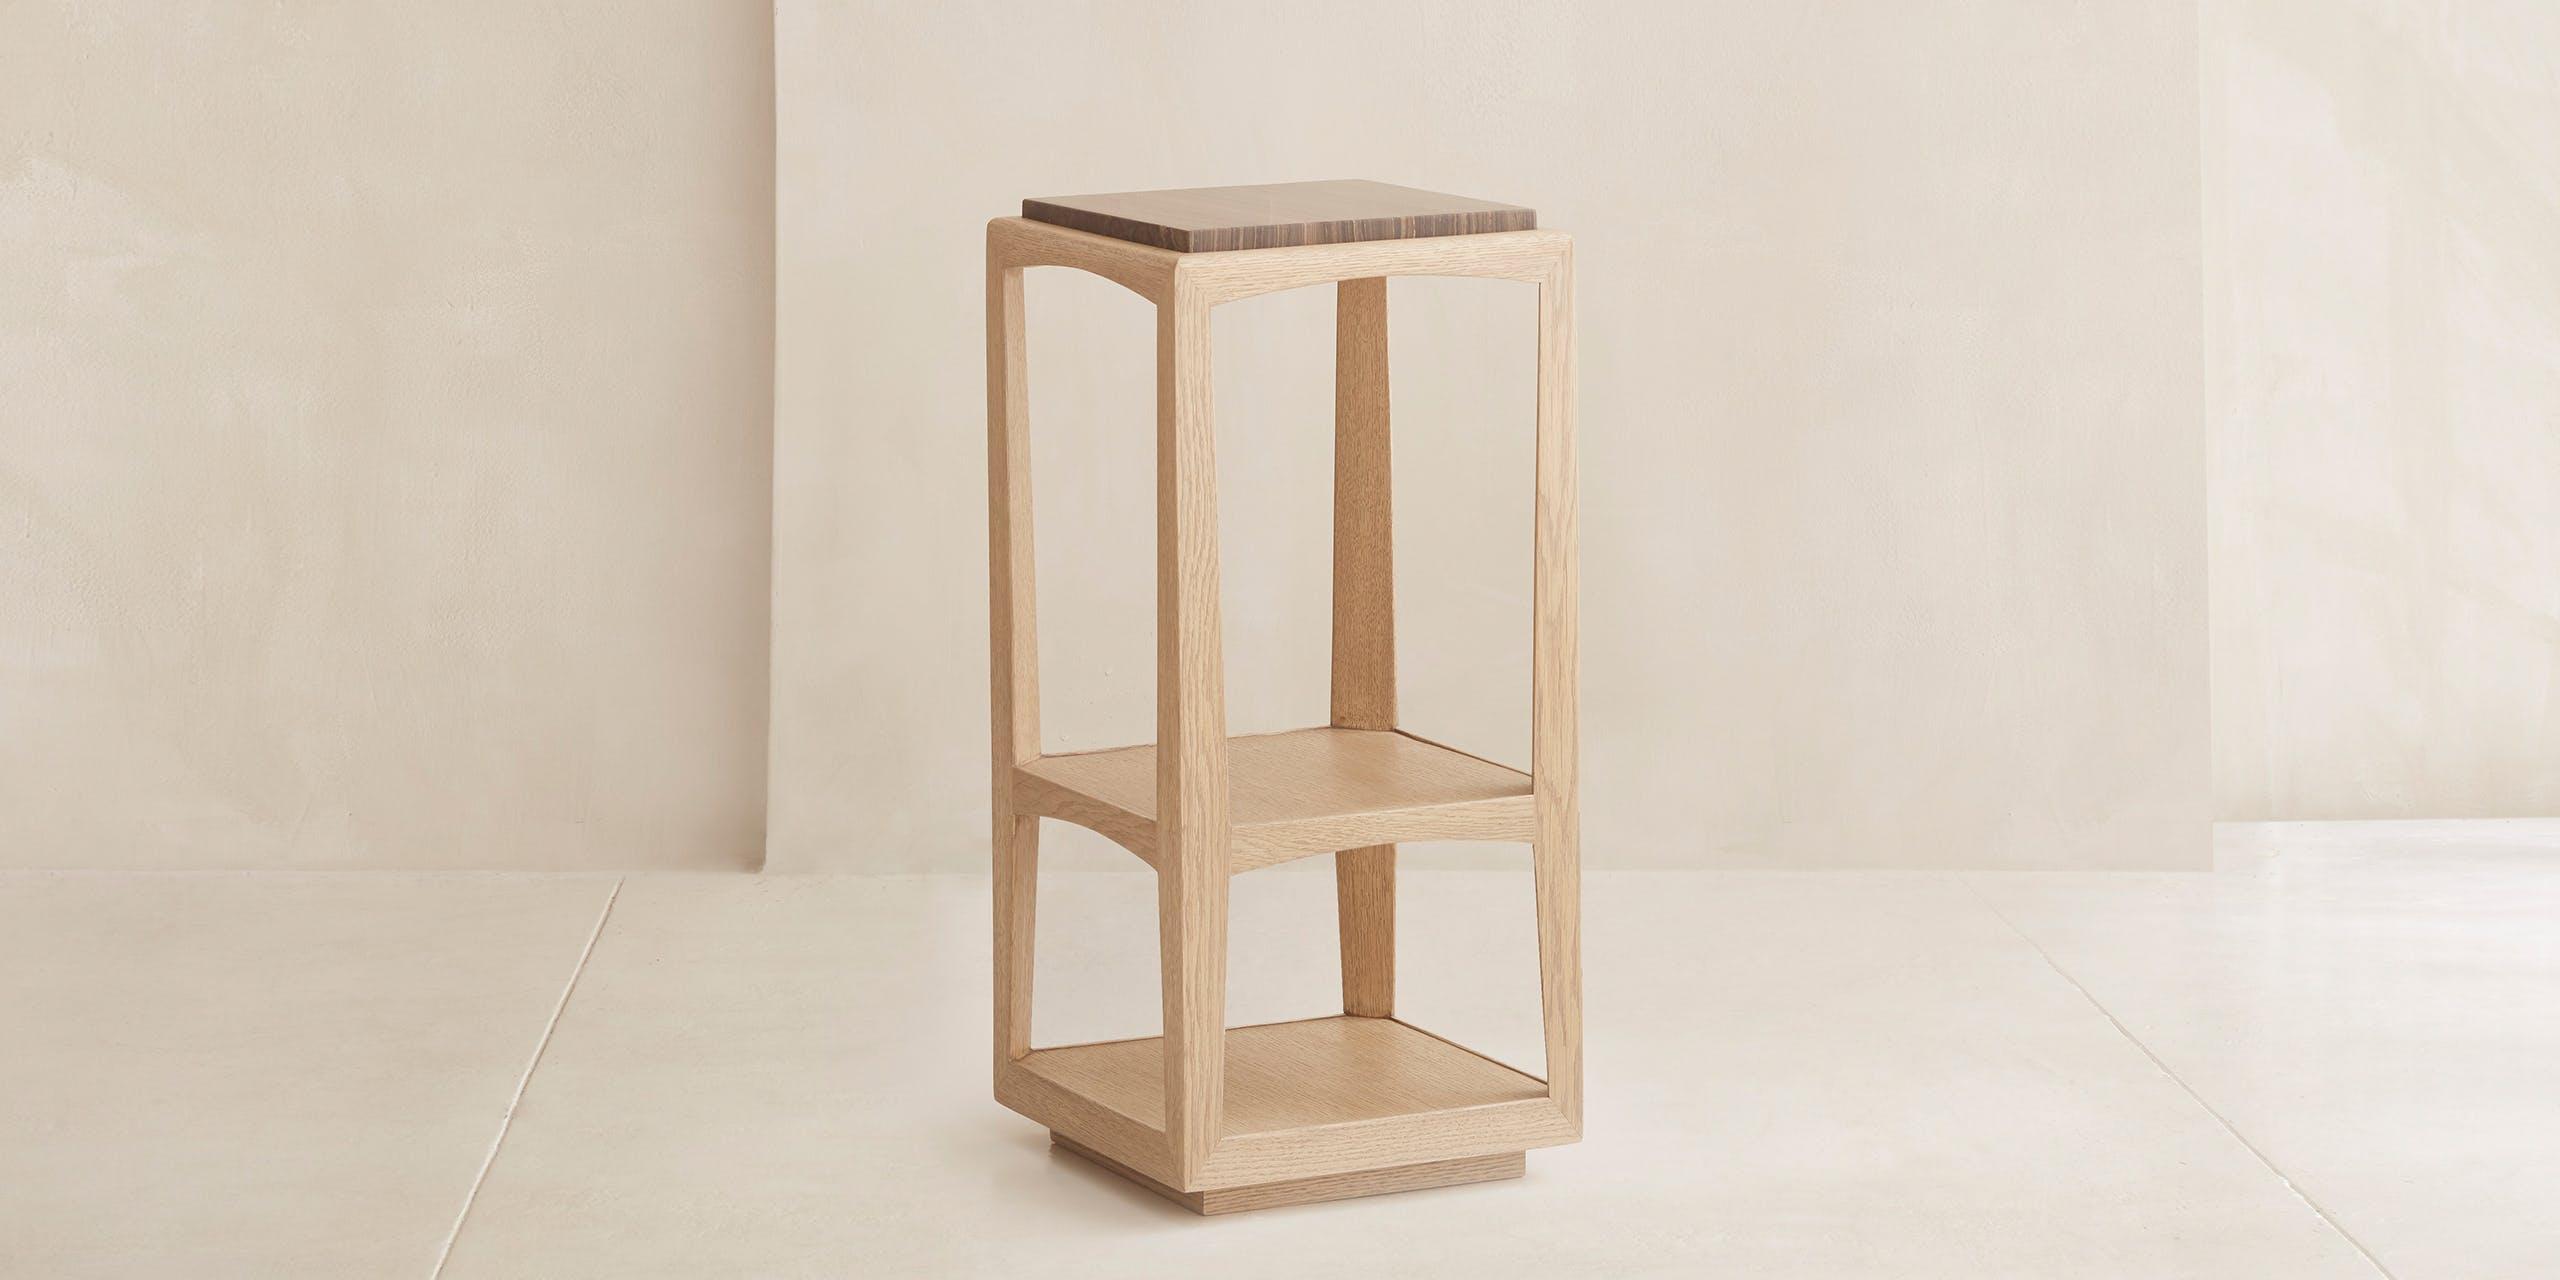 Avery table high stone main.jpg?ixlib=rails 2.1